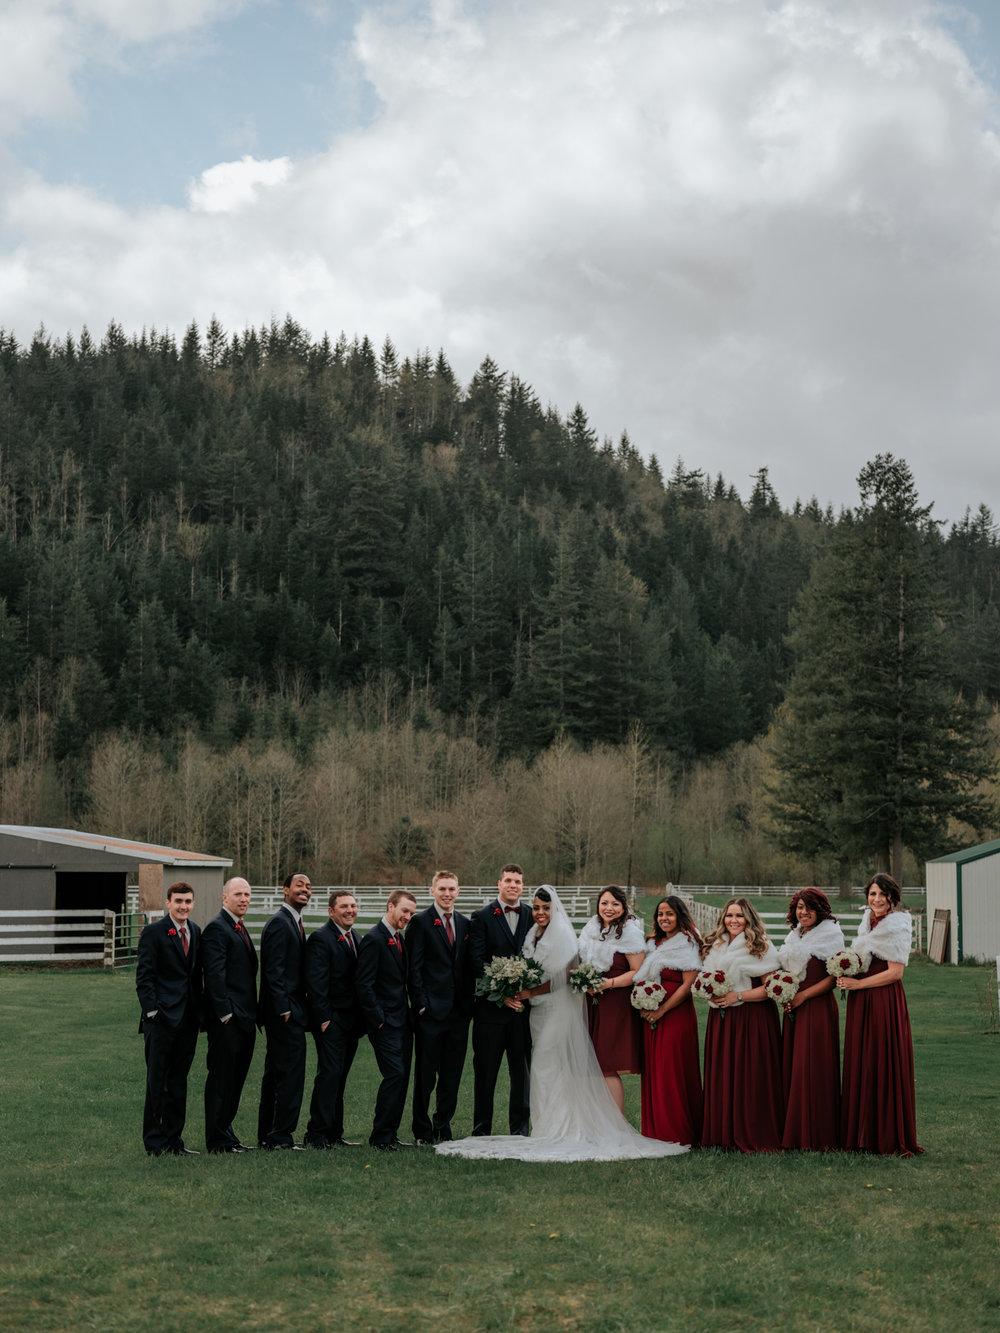 Stolen Glimpses Seattle Wedding Photographer at Rein Fire Ranch 43.jpg